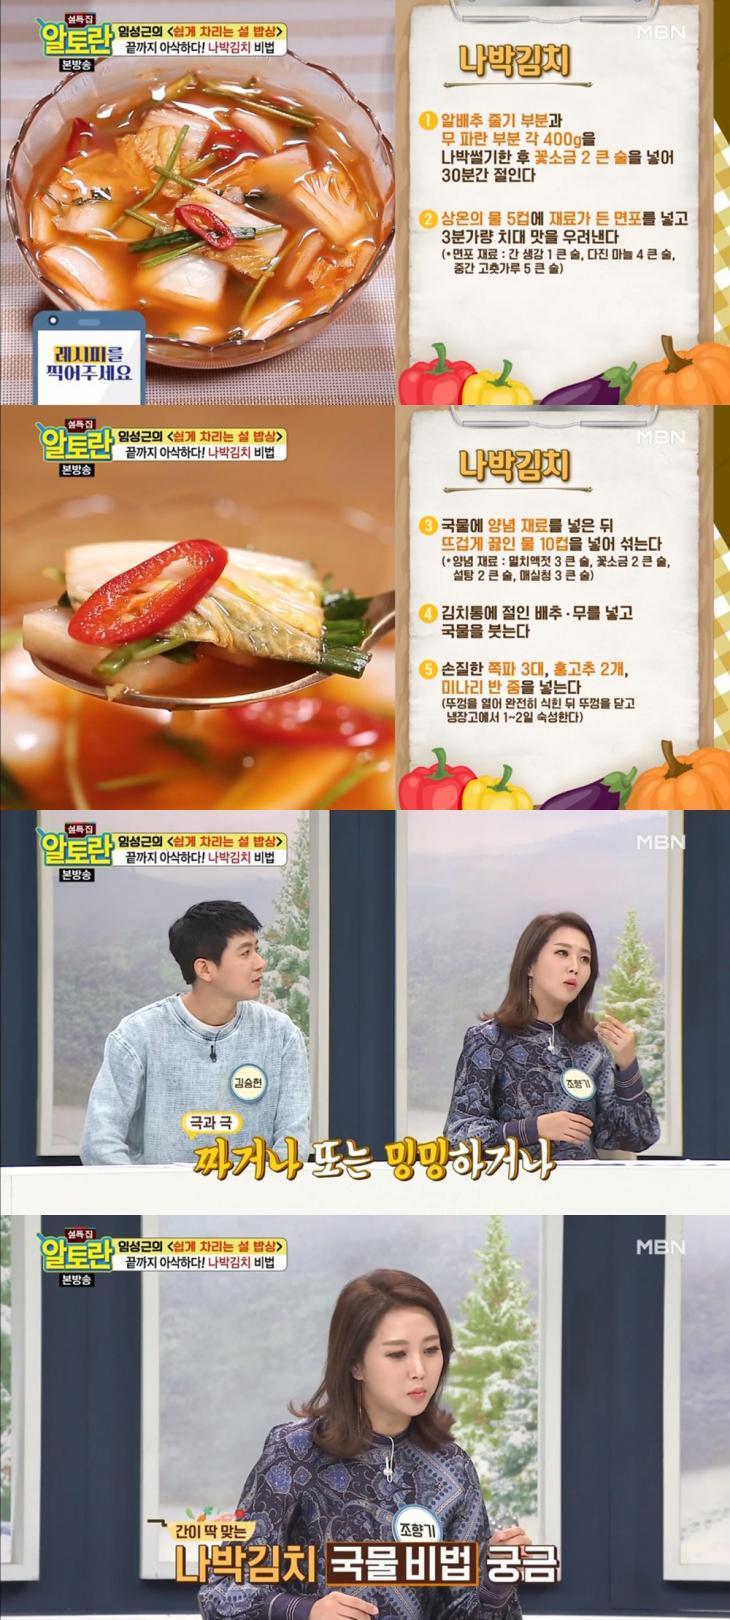 MBN '알토란' 방송 캡처